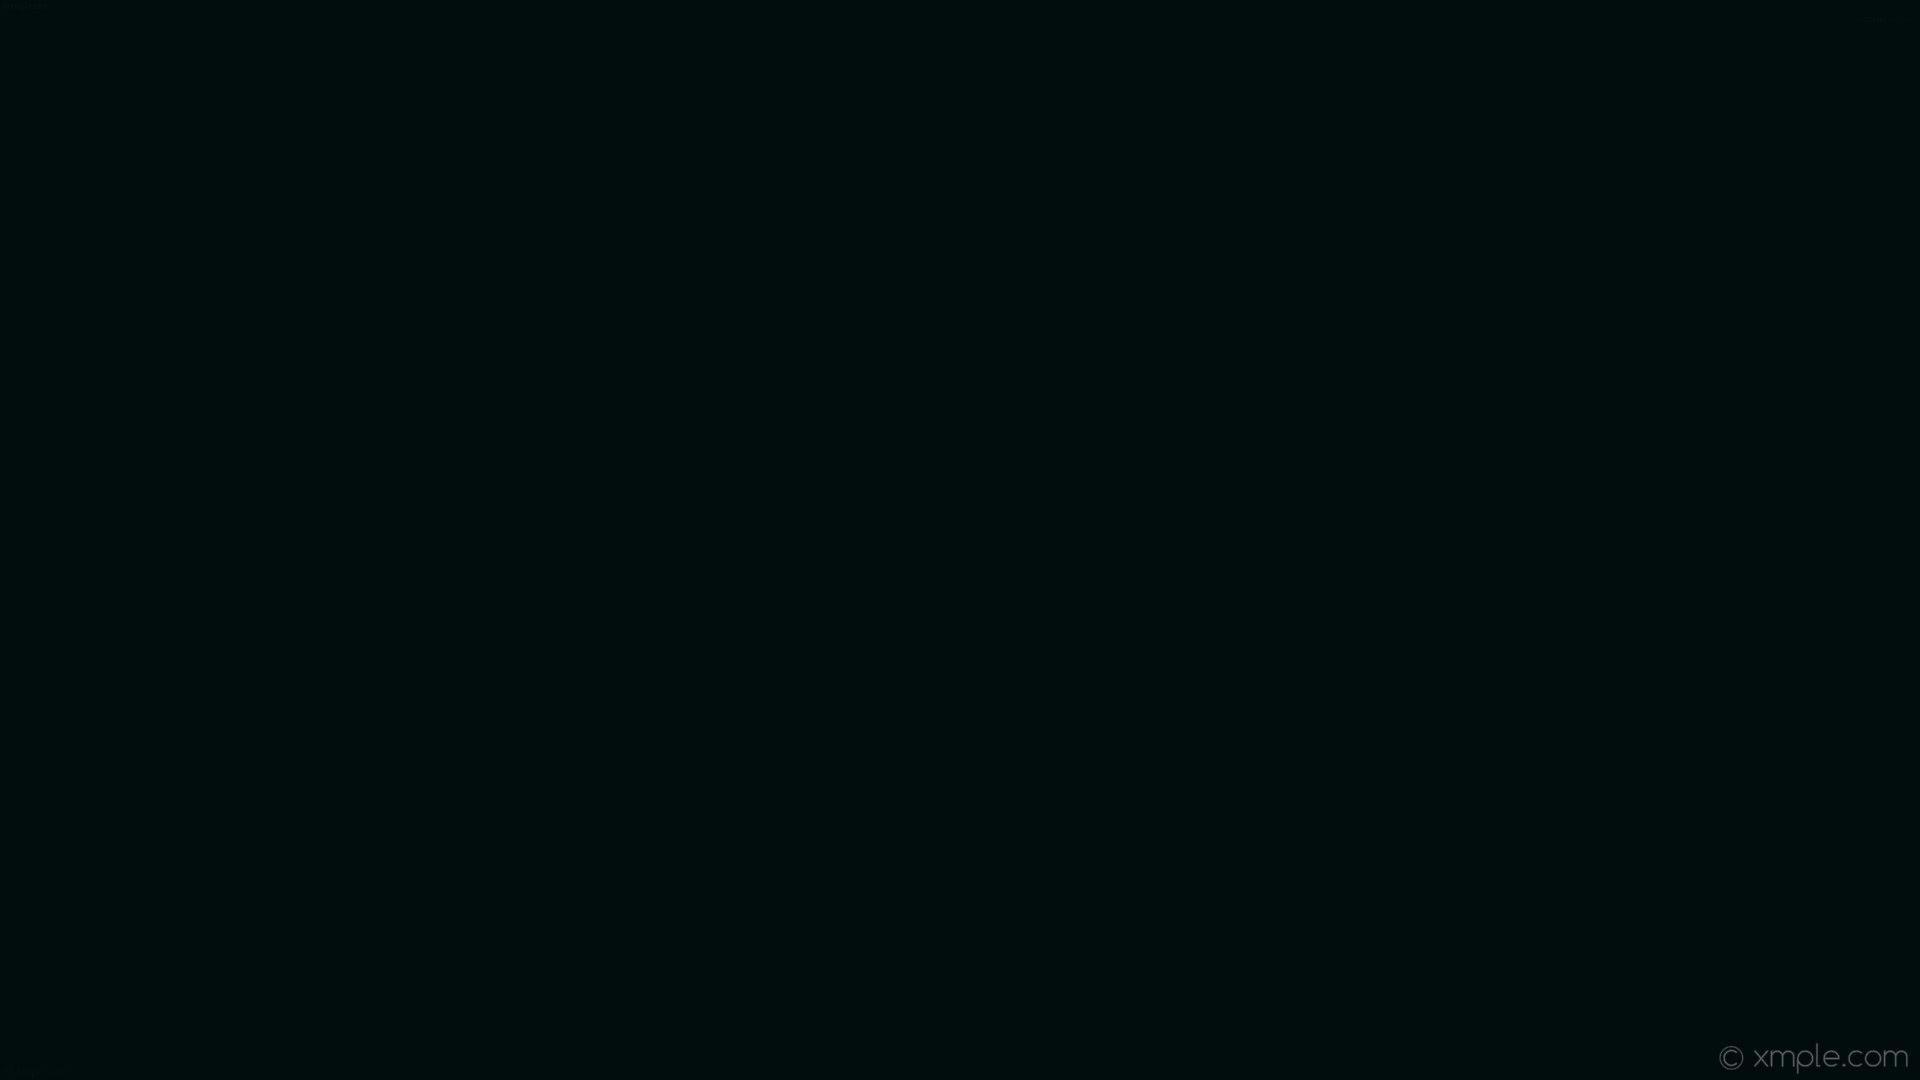 Solid Black Wallpaper 4k | Bopeng Wall